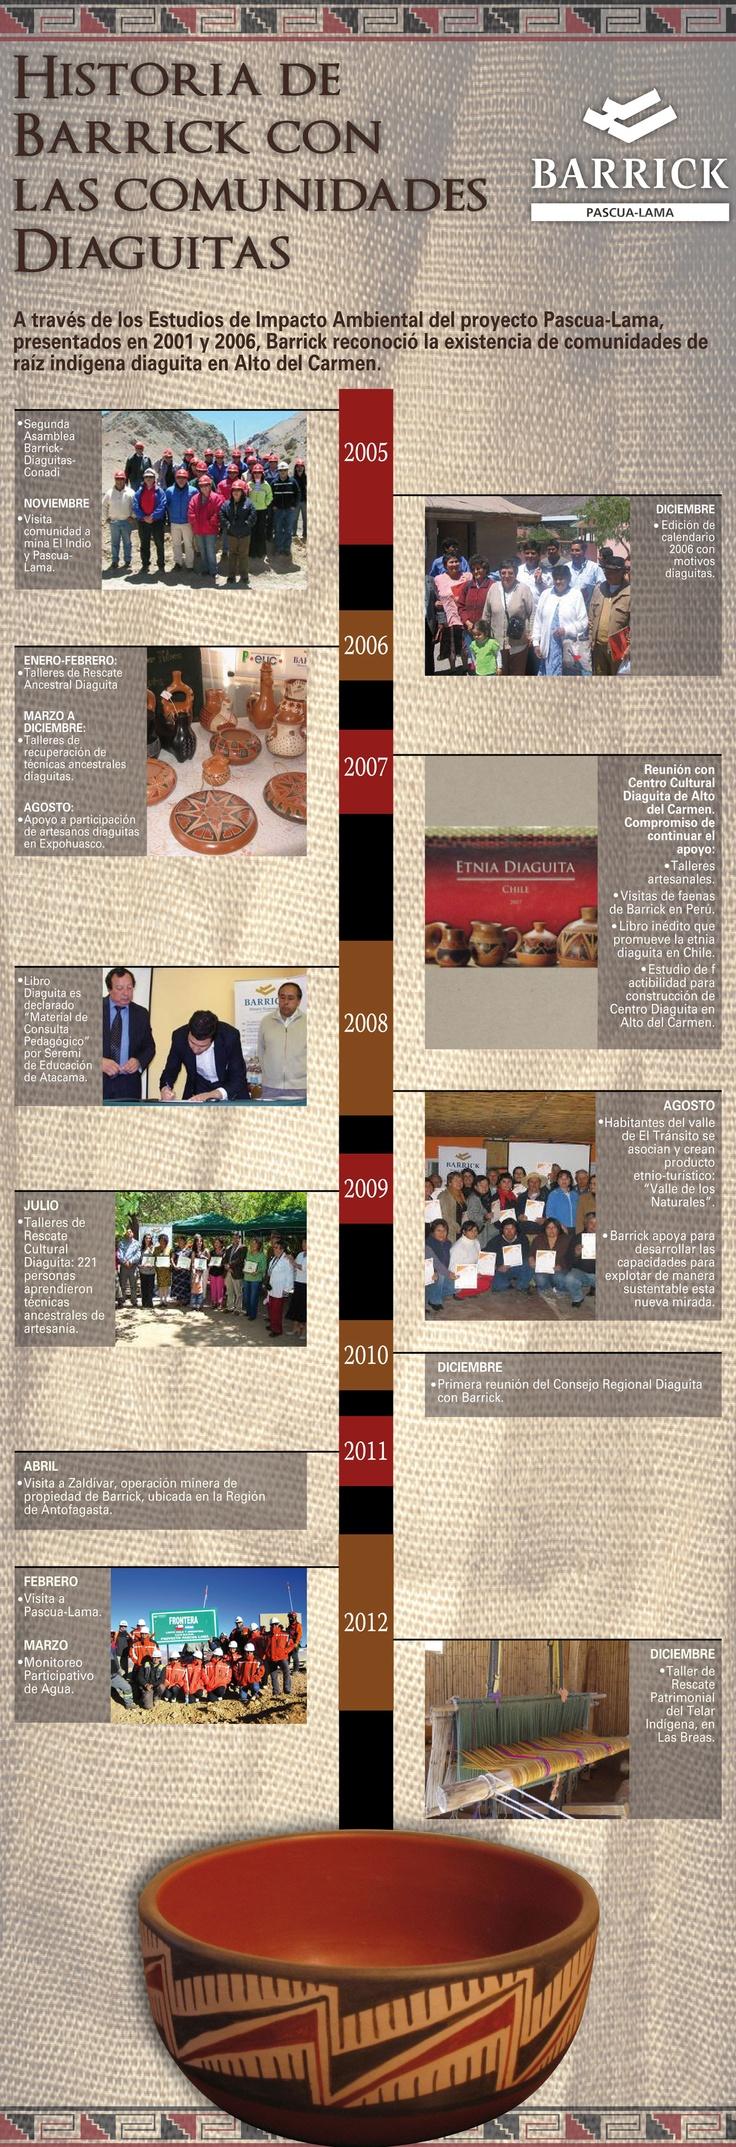 Historia de Barrick con las comunidades diaguitas - Infografía completa en el sitio de Barrick Sudamérica http://barricksudamerica.com